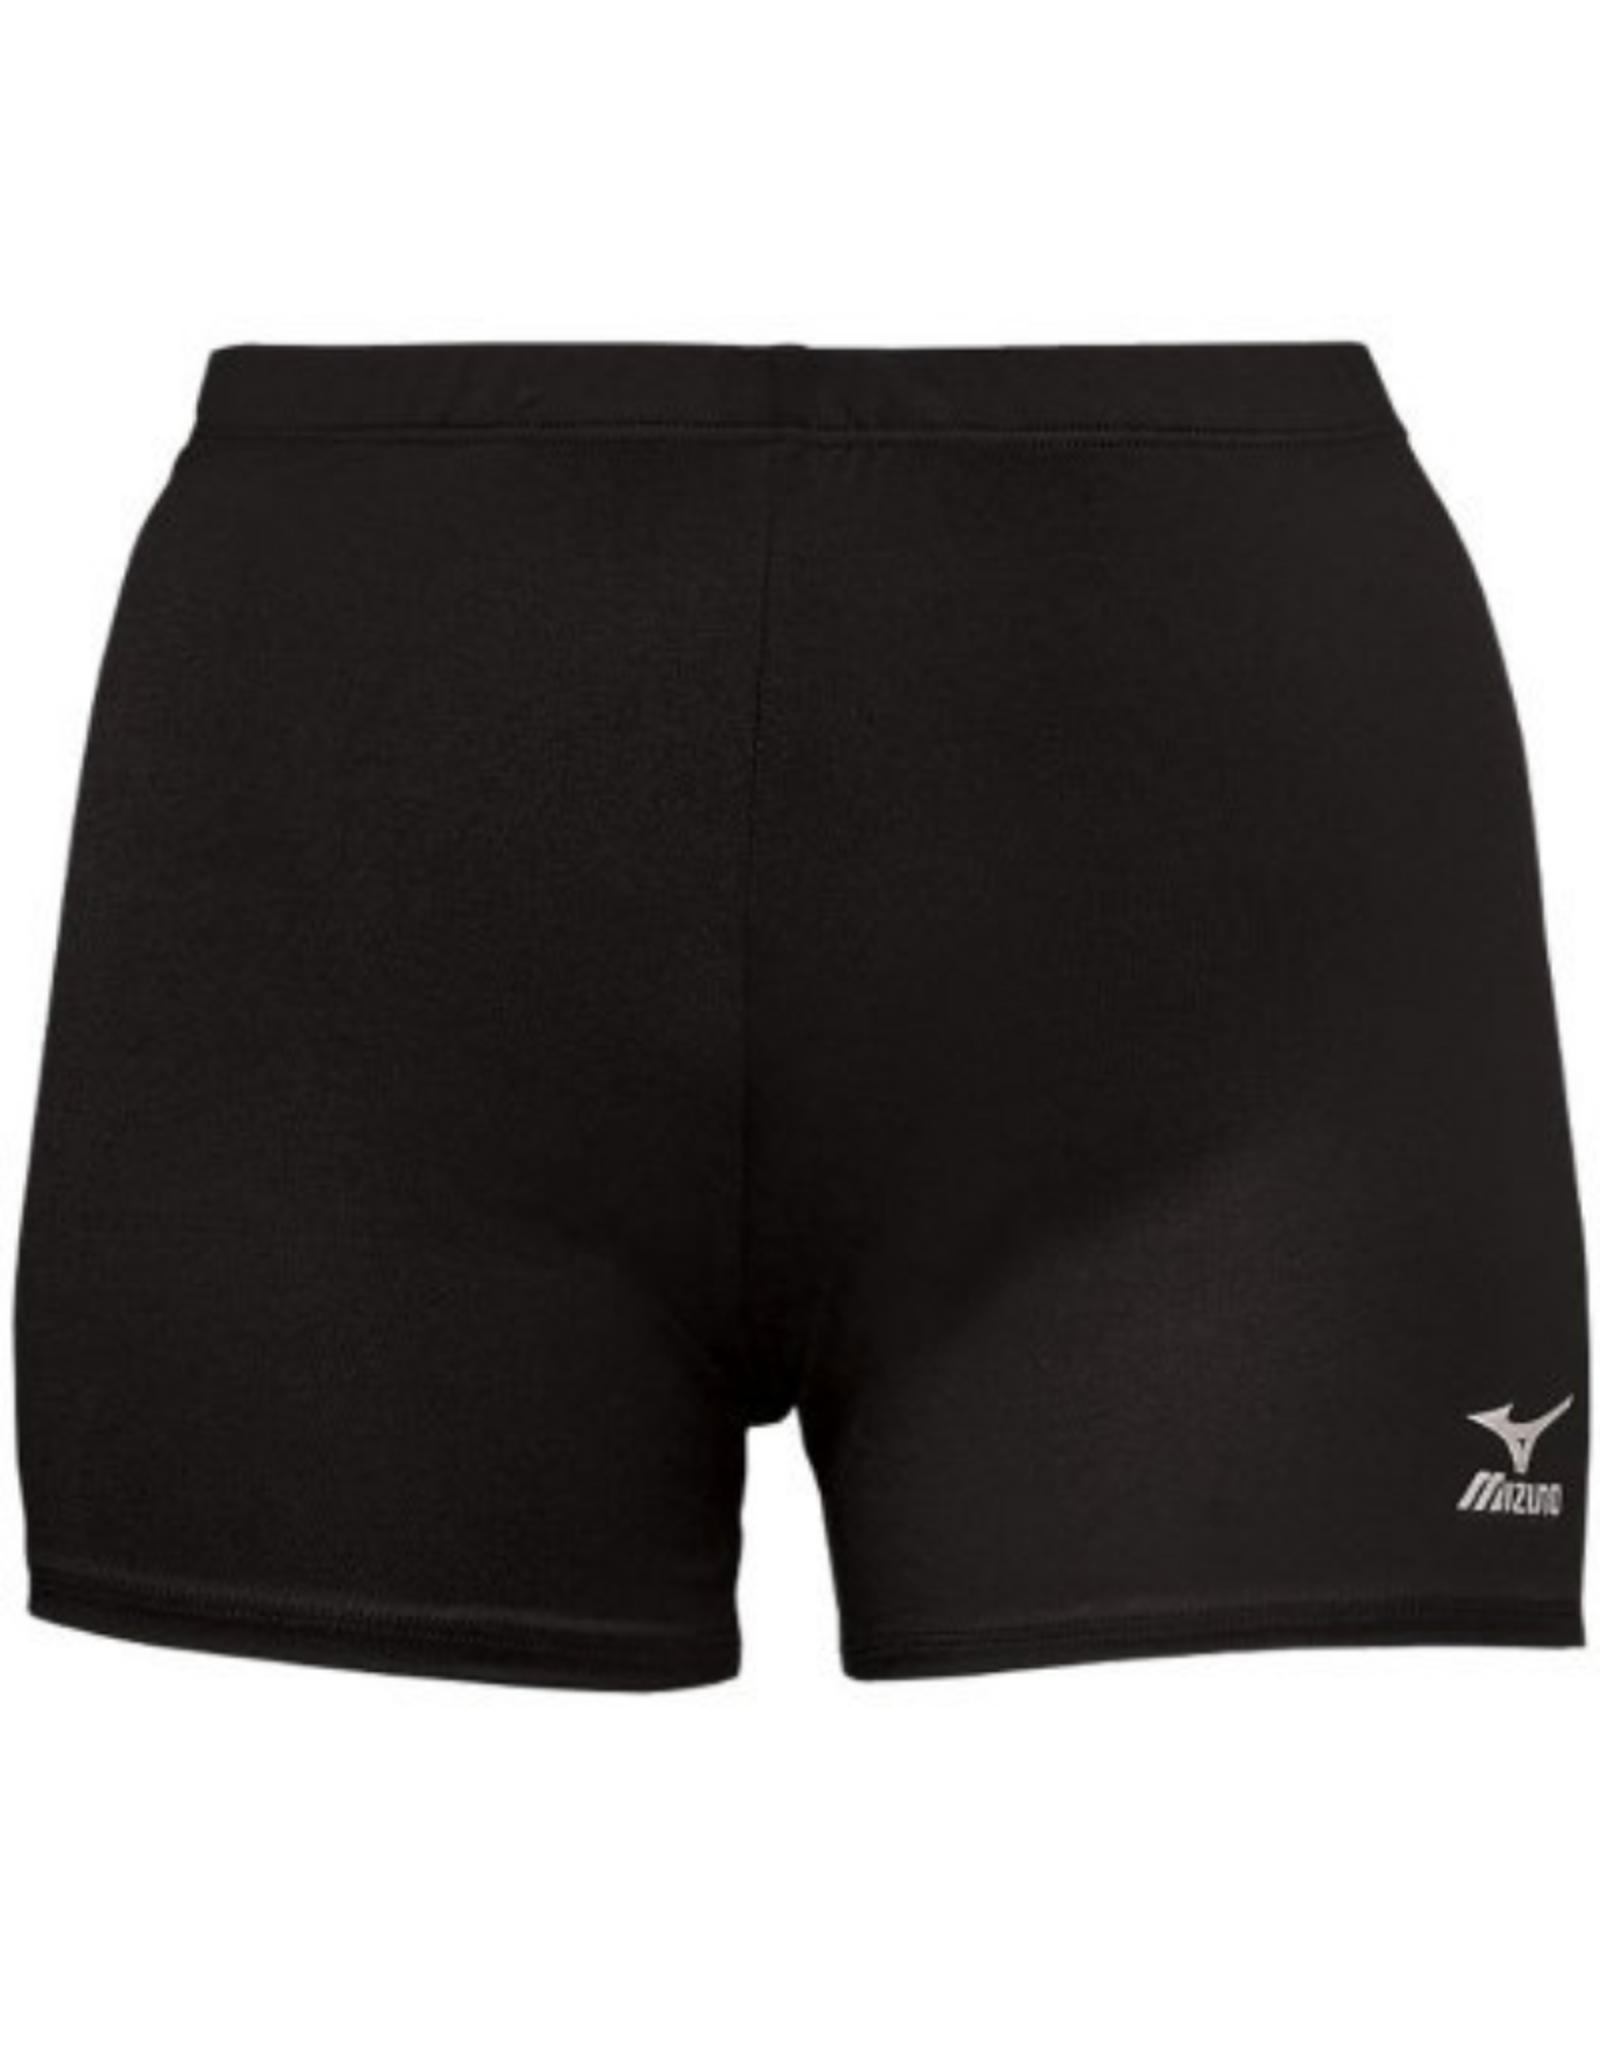 "Mizuno Women's Volleyball Short 4"" Black"